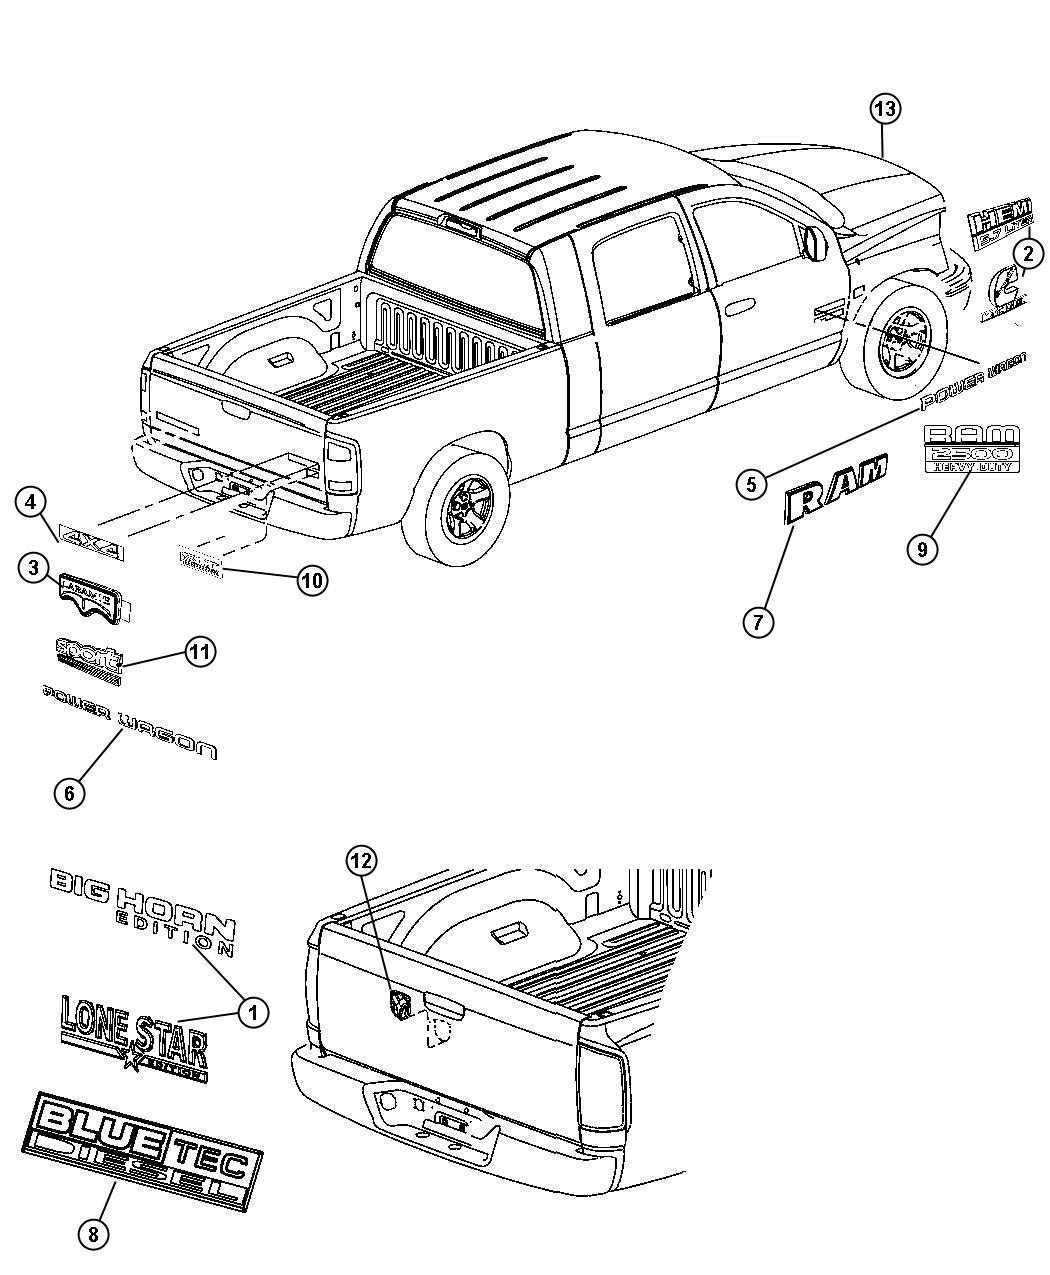 Dodge Ram 1500 Nameplate. Tailgate. Big horn. Lower right